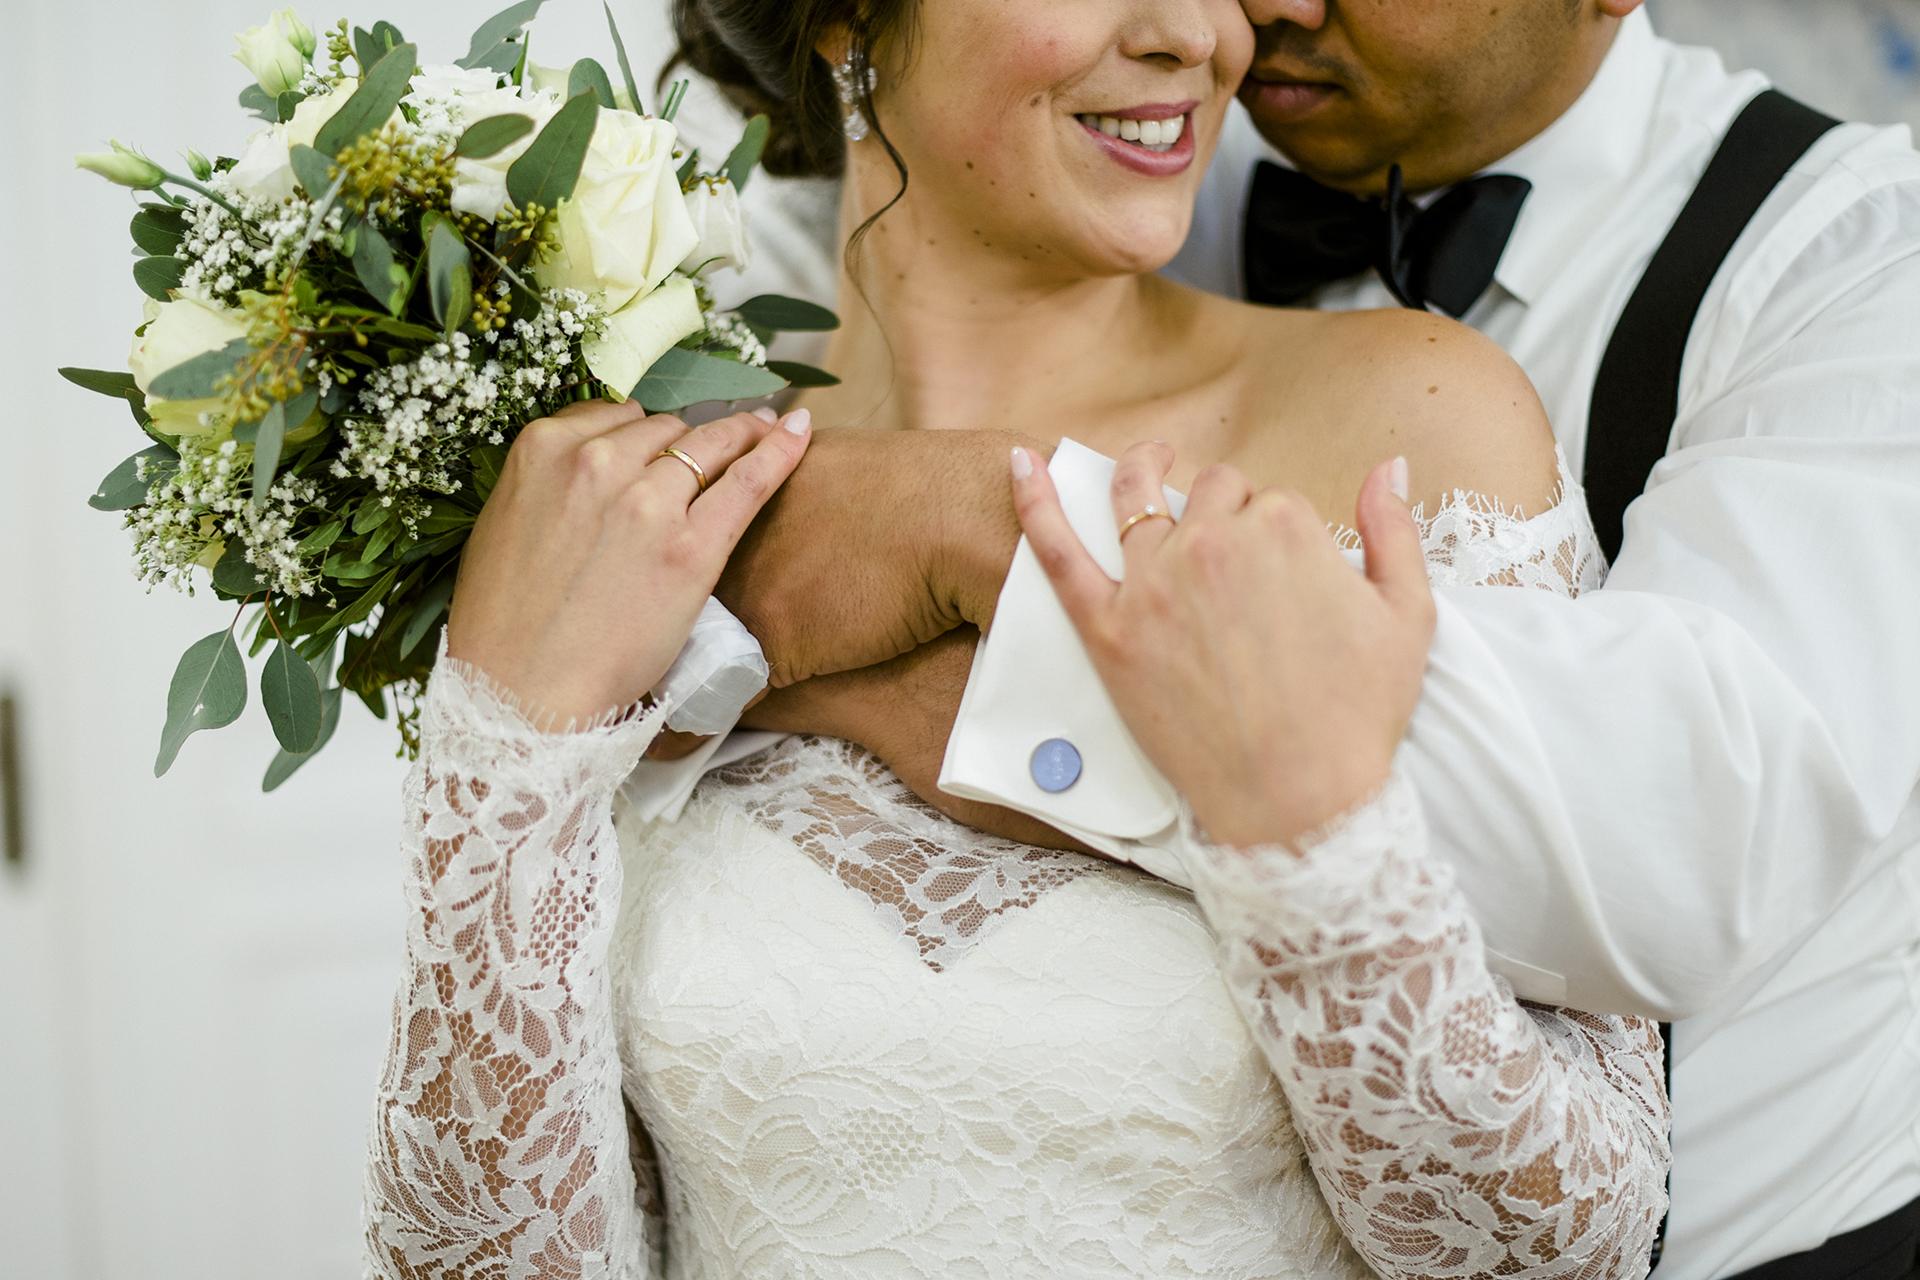 Hochzeitsreportage_J&D_053_Caroline Queda Fotografie